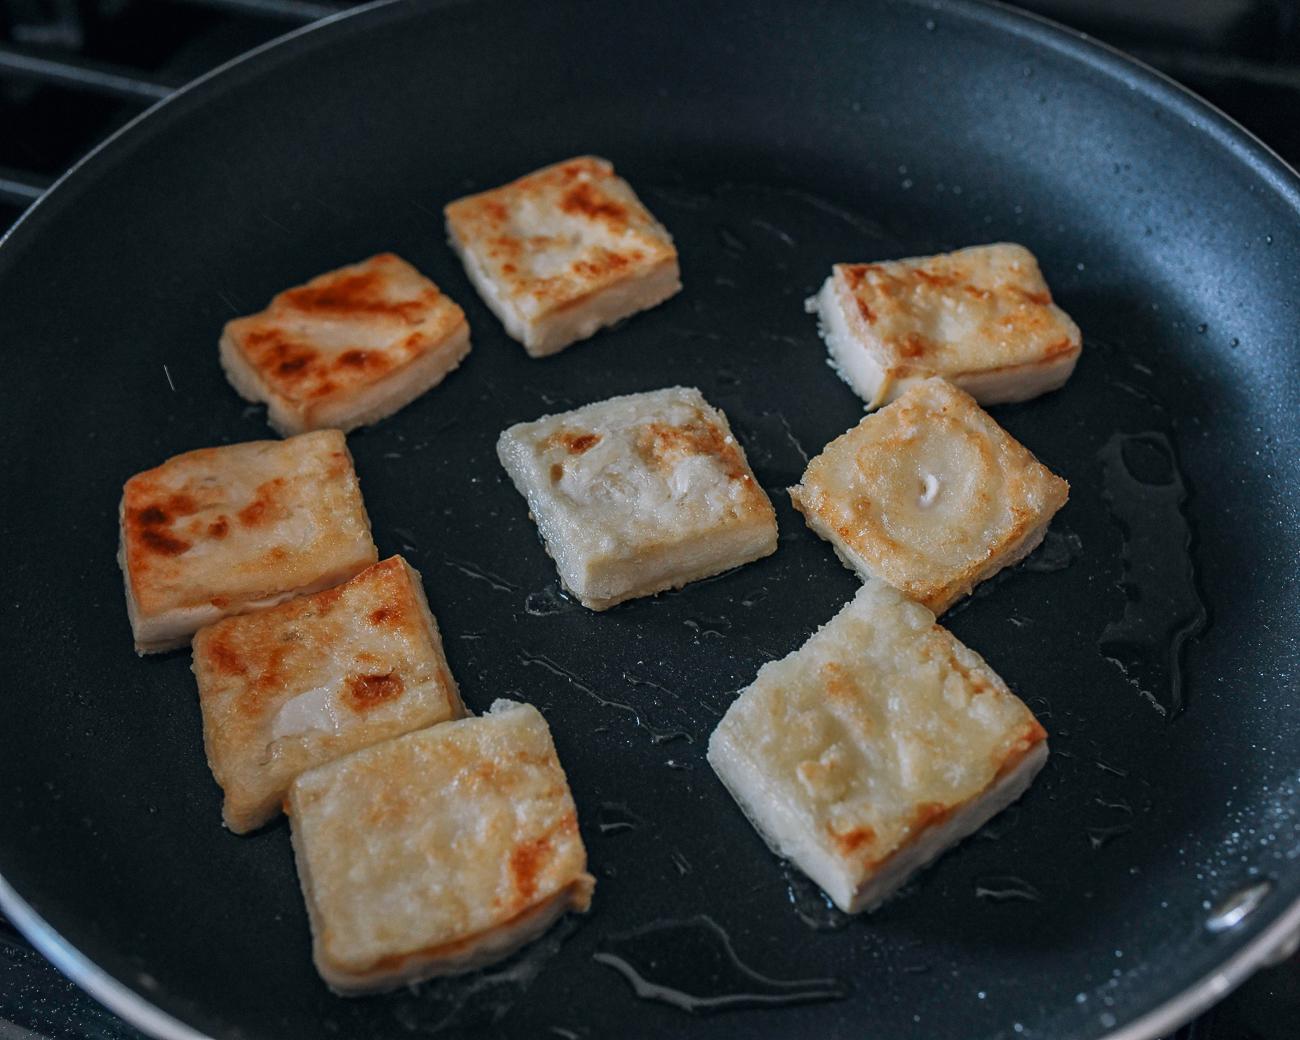 Pan-frying crispy tofu